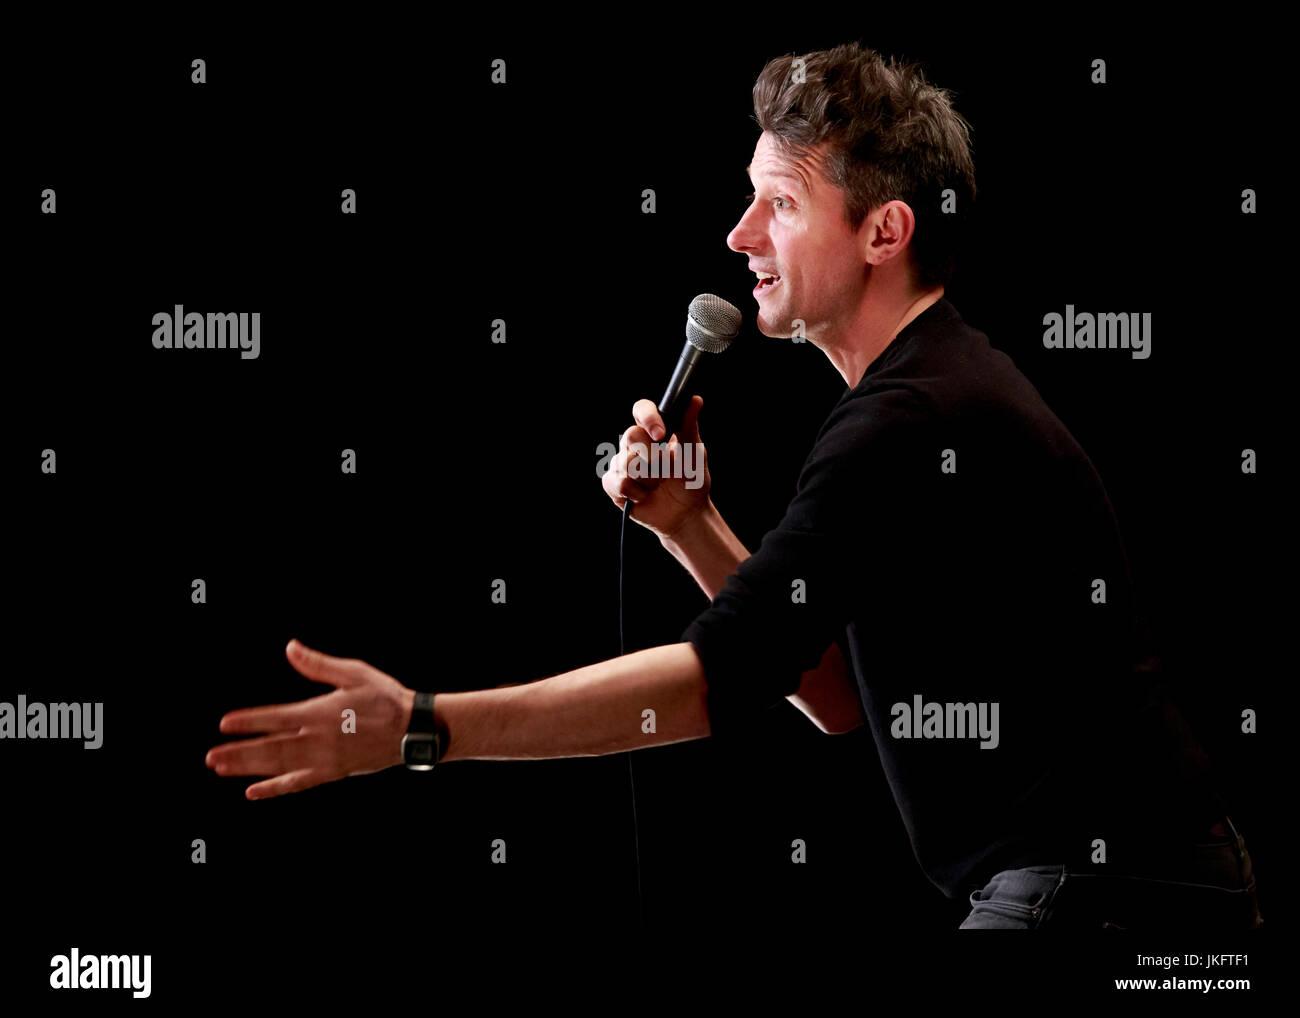 Stuart Goldsmith, Comedian, Joker Comedy Club, Southend, Essex © Clarissa Debenham / Alamy - Stock Image